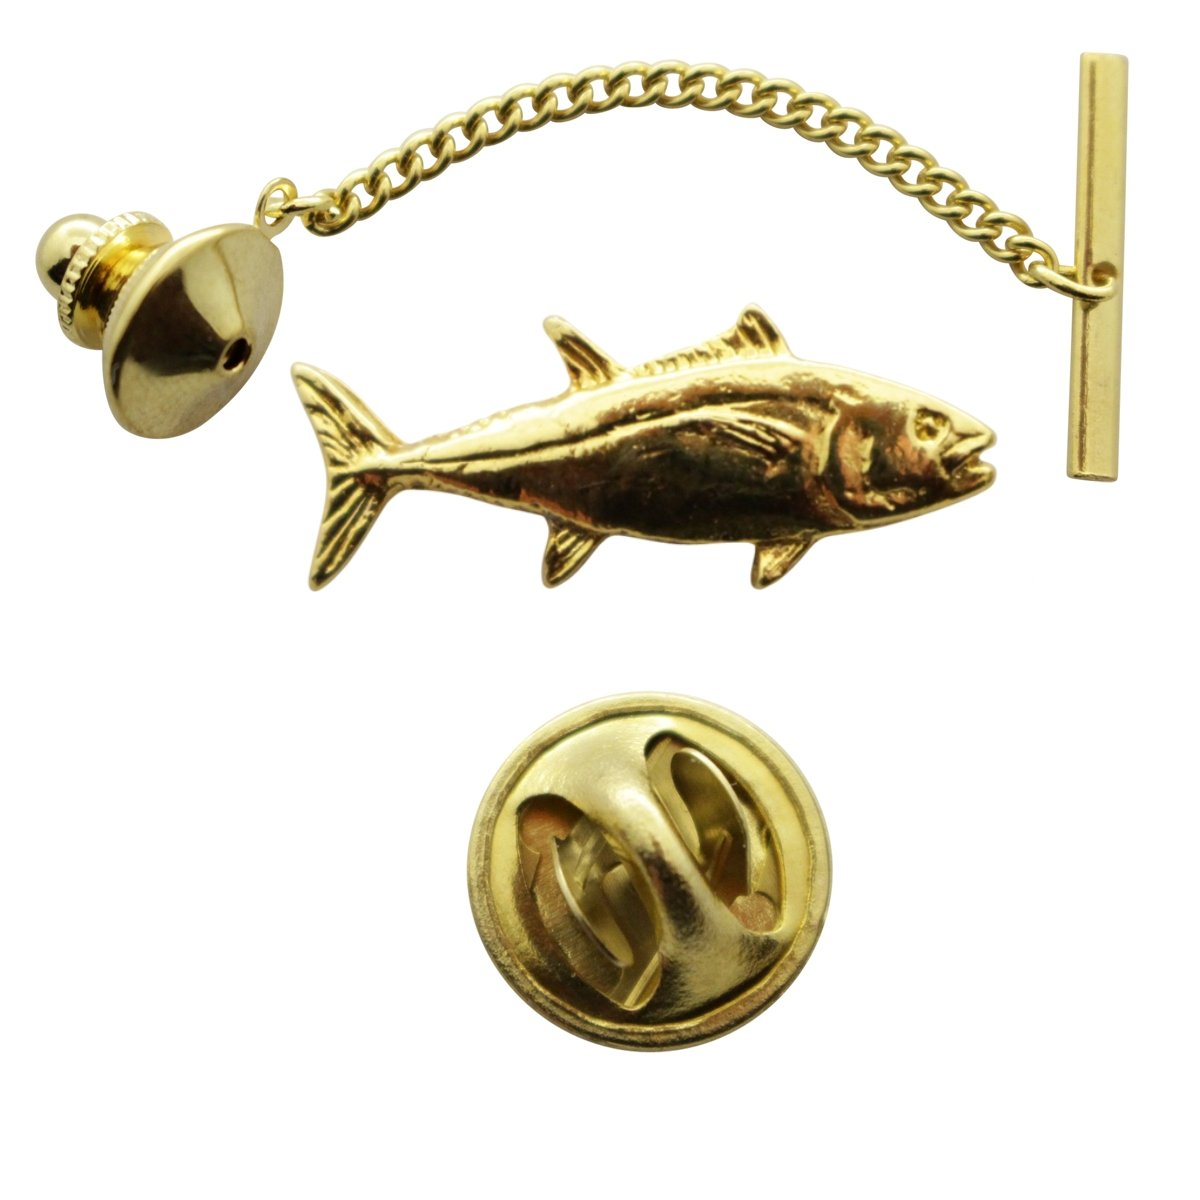 Tuna Tie Tack ~ 24K Gold ~ Tie Tack or Pin ~ Sarahs Treats /& Treasures